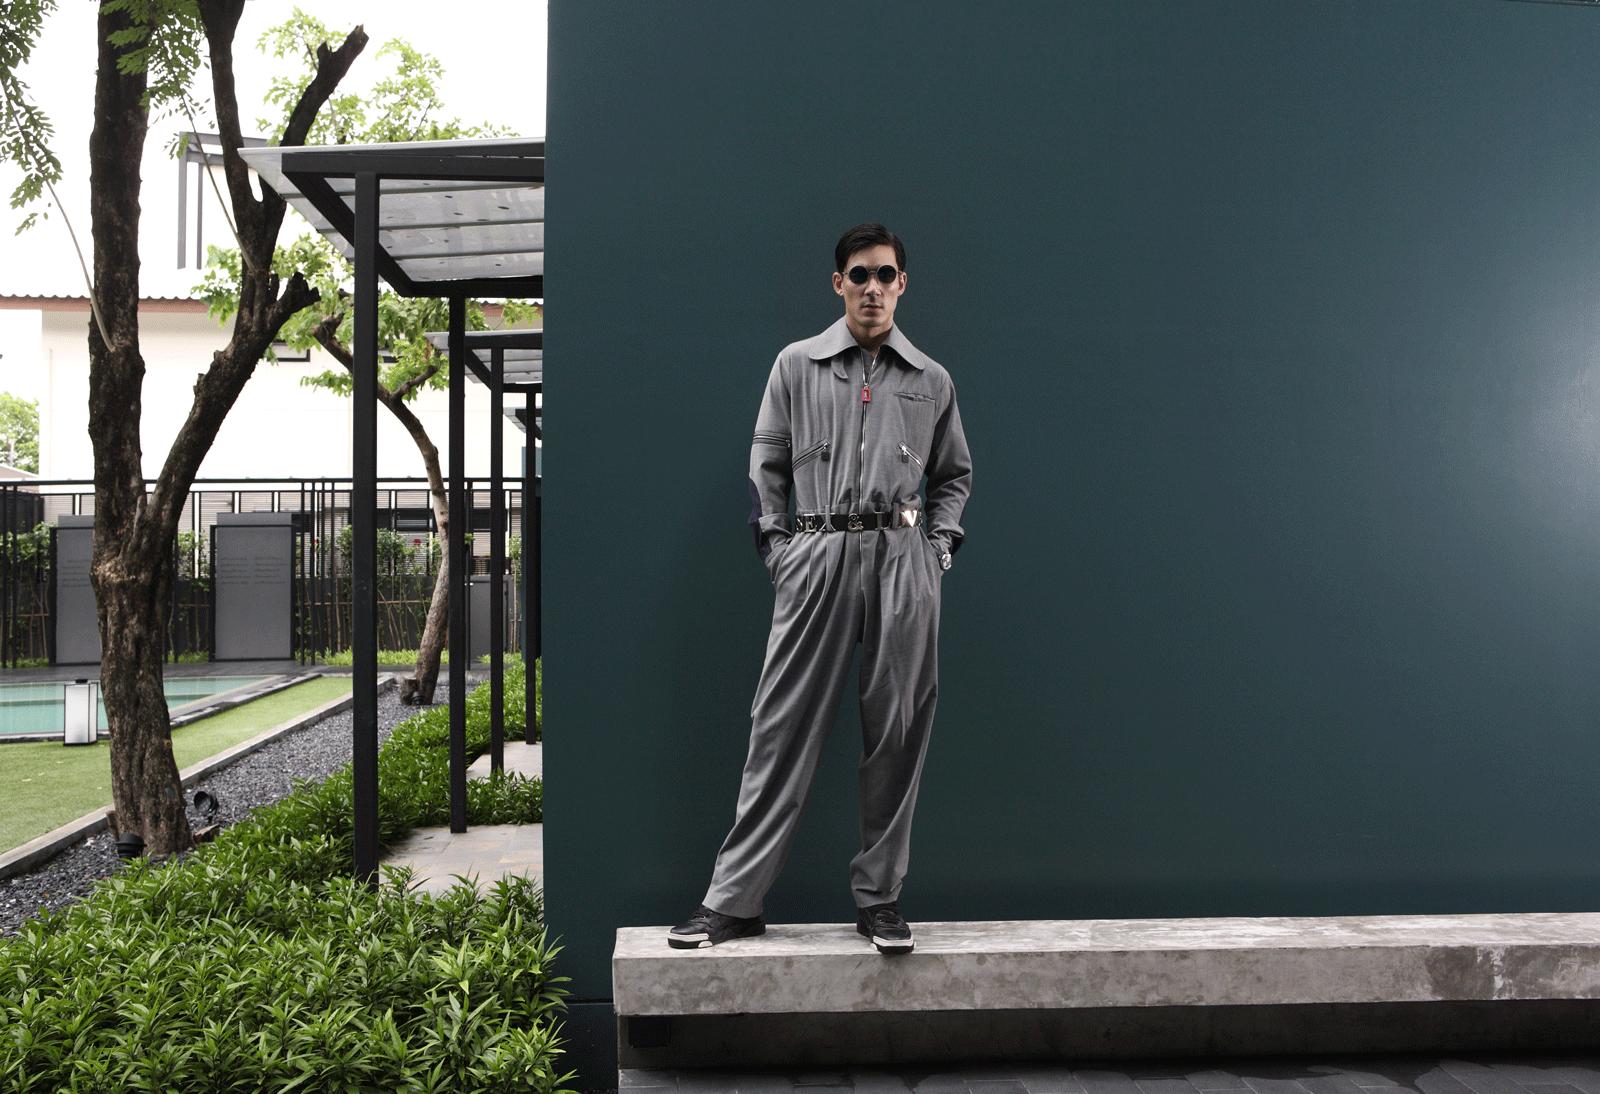 clothes : Everyday Karmakamet / sunglasses : TAVAT